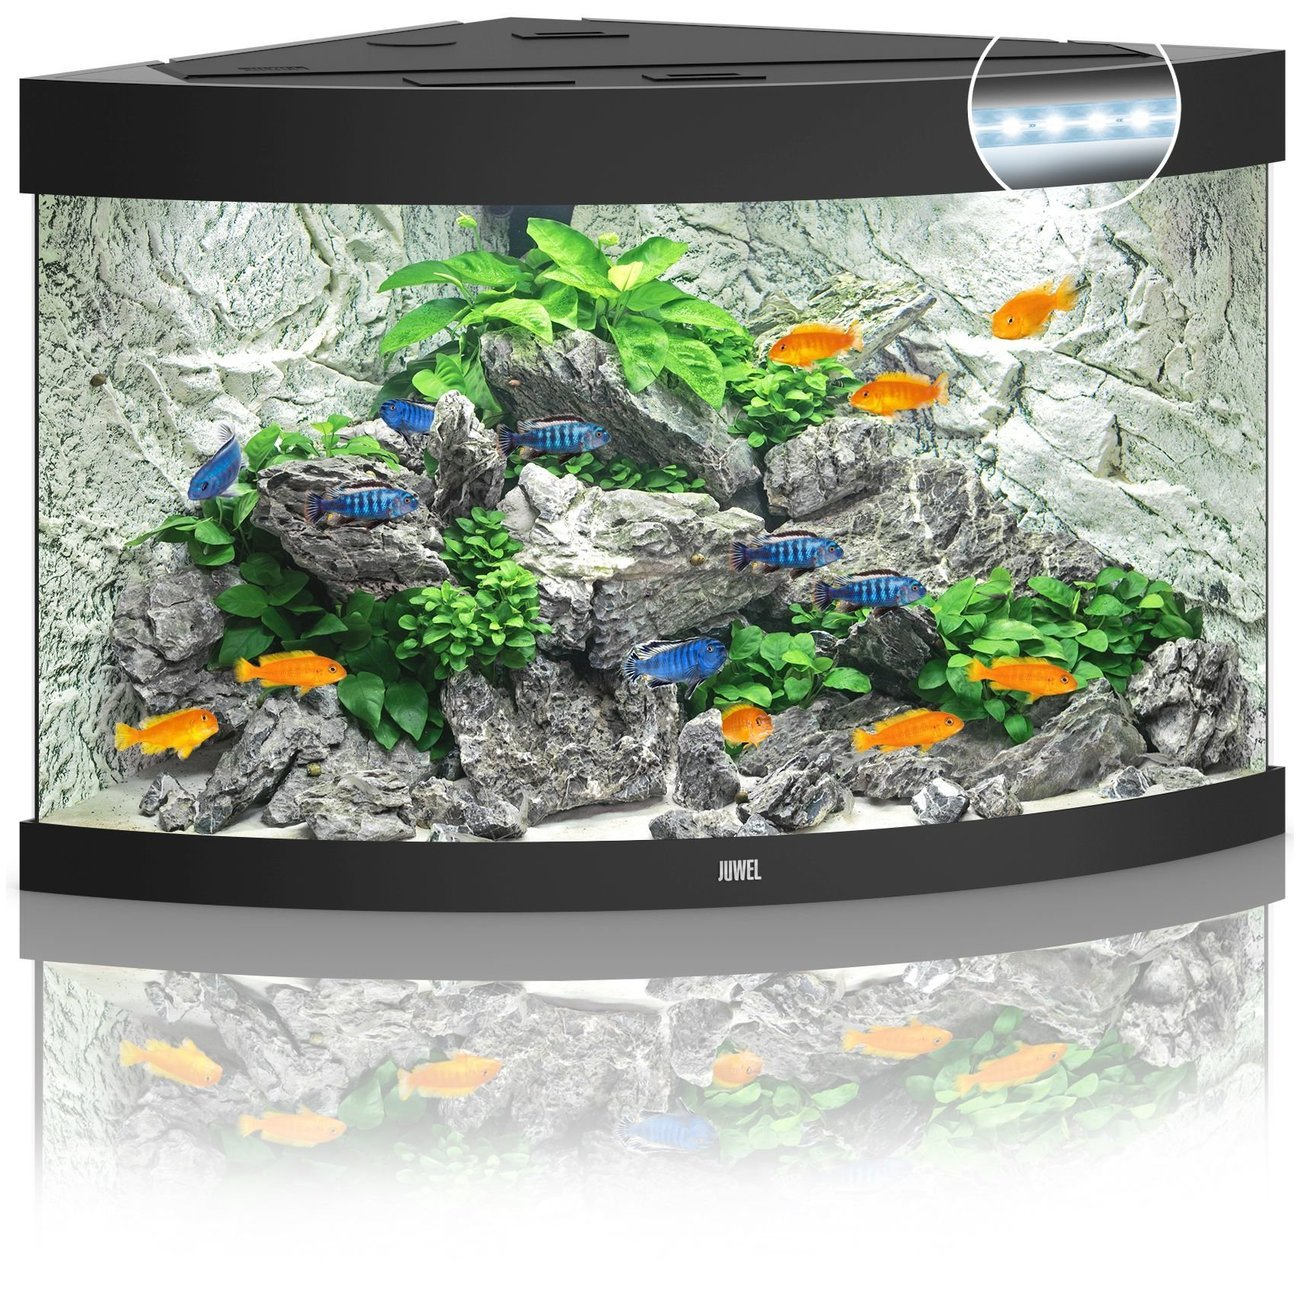 JUWEL Trigon 190 LED Aquarium, 190 Liter, schwarz